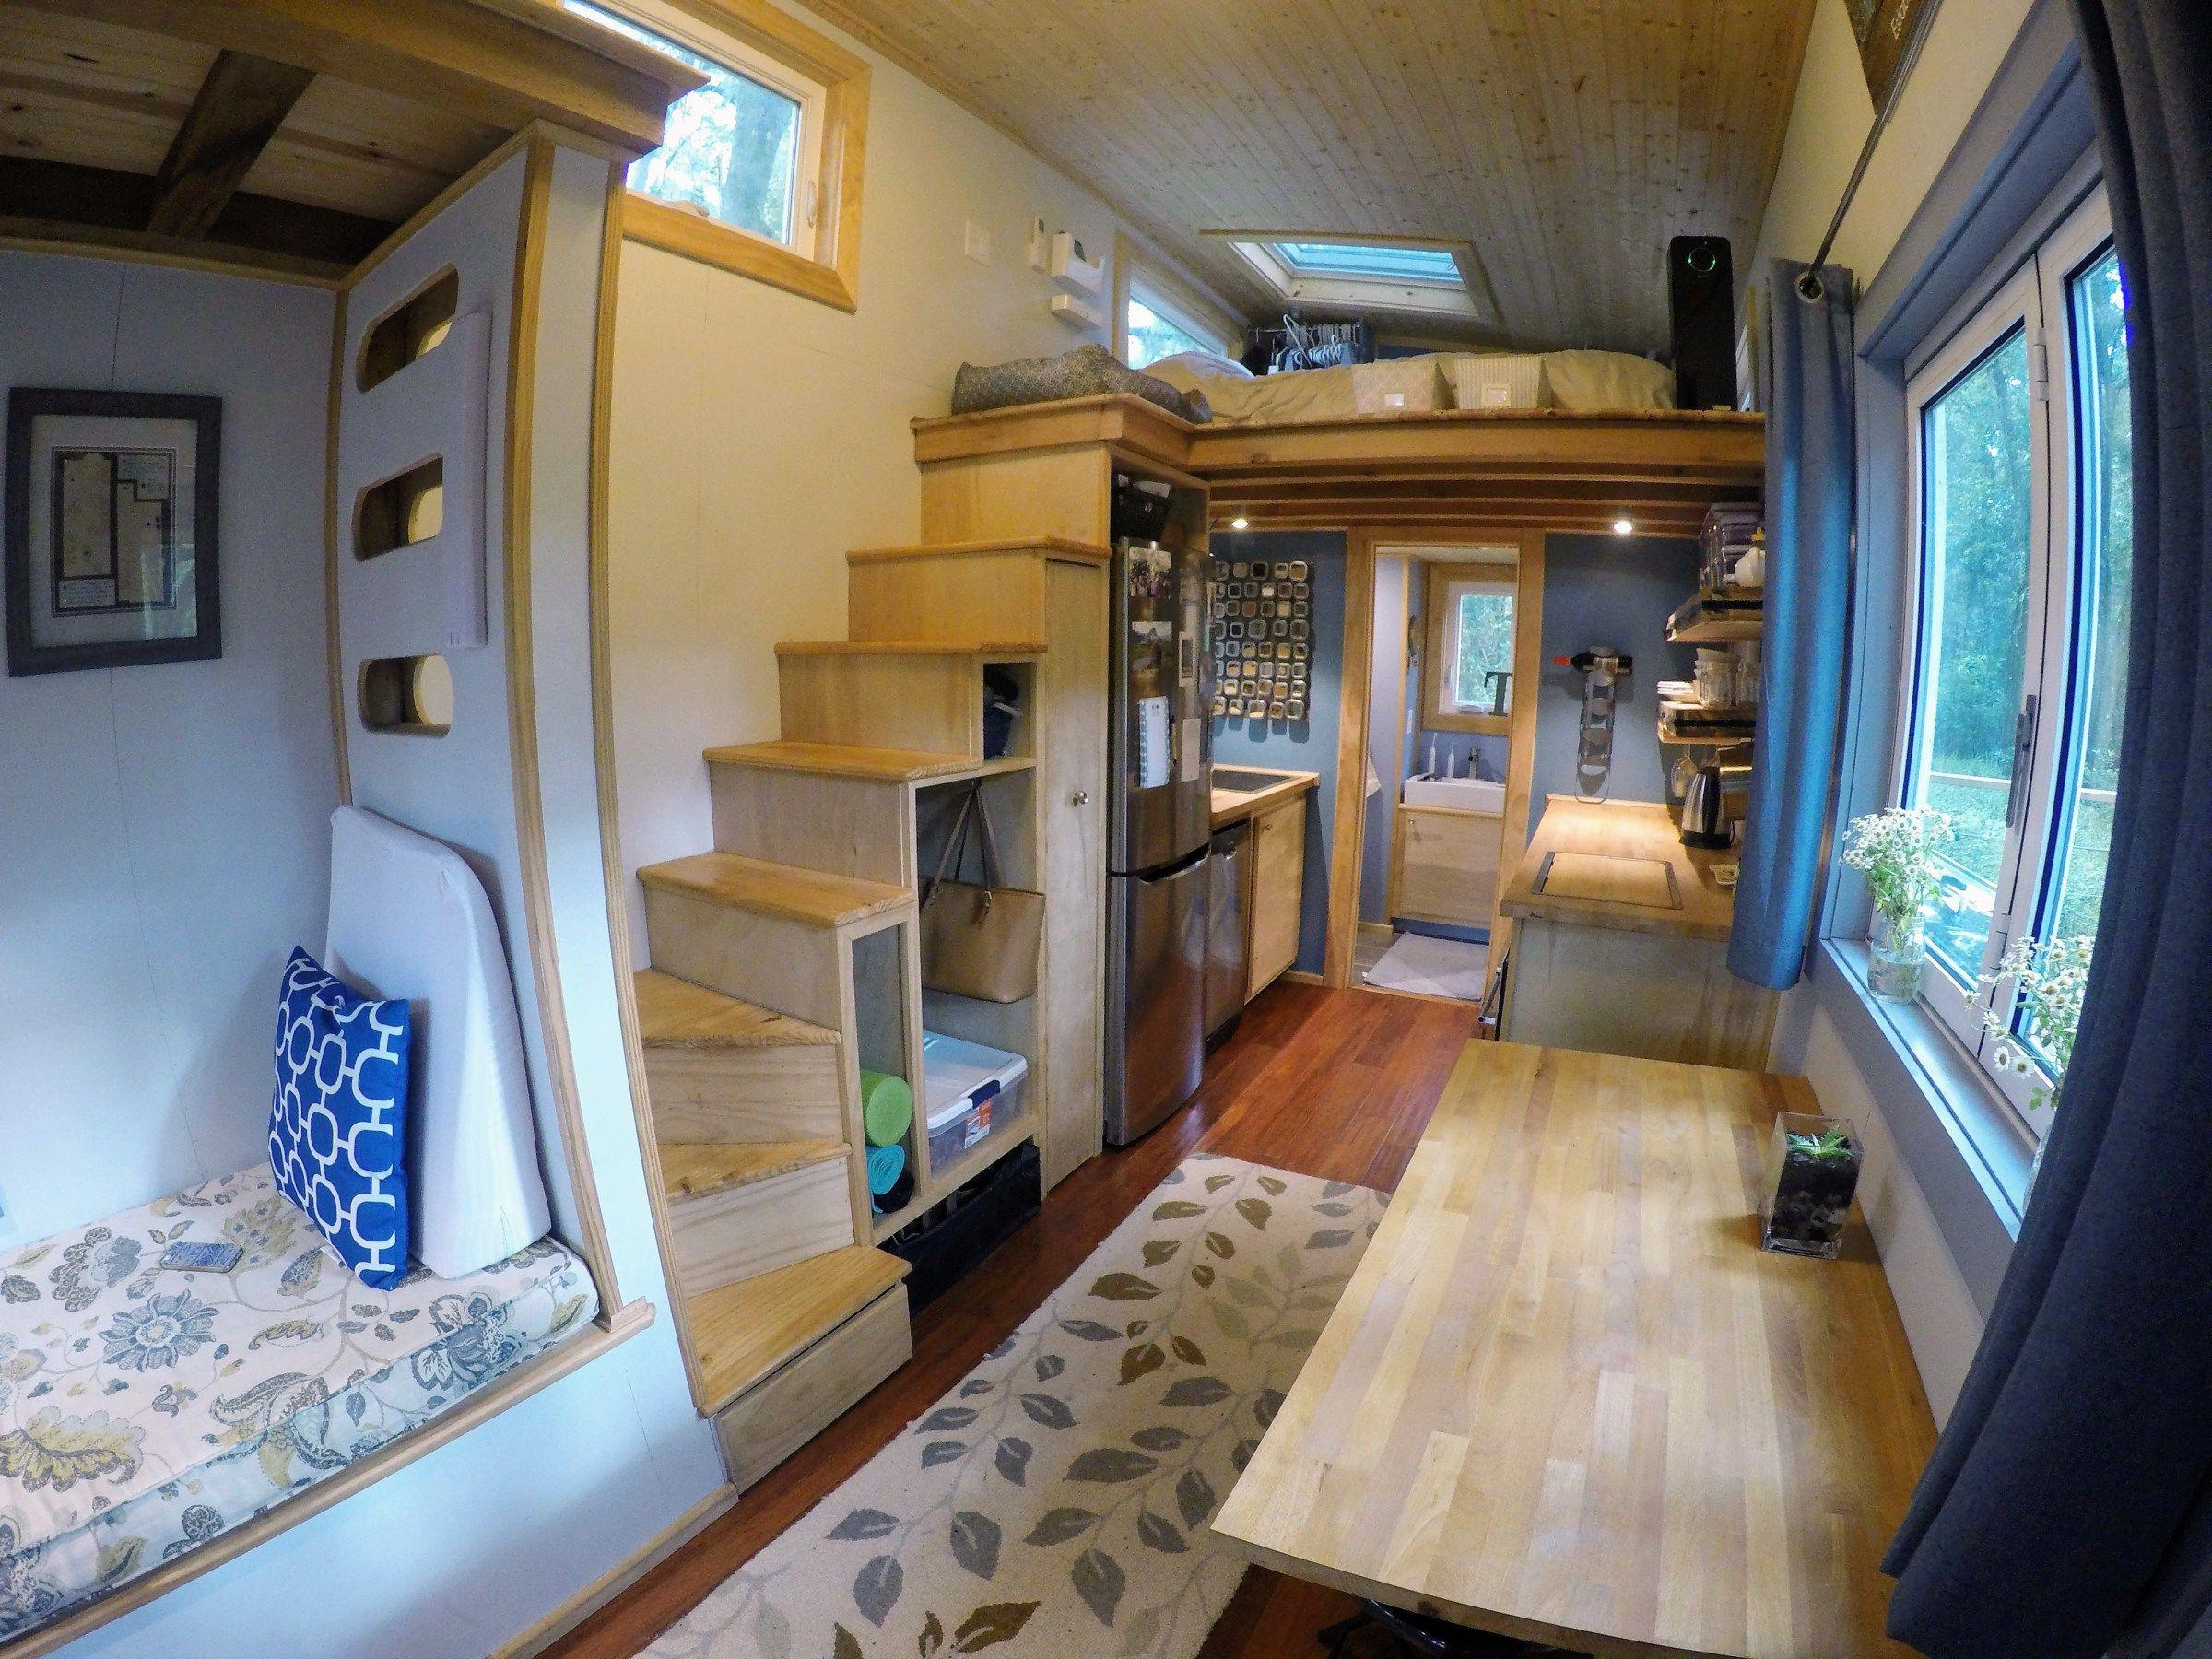 Austin Heidi S Tiny House Creates Contentment Small